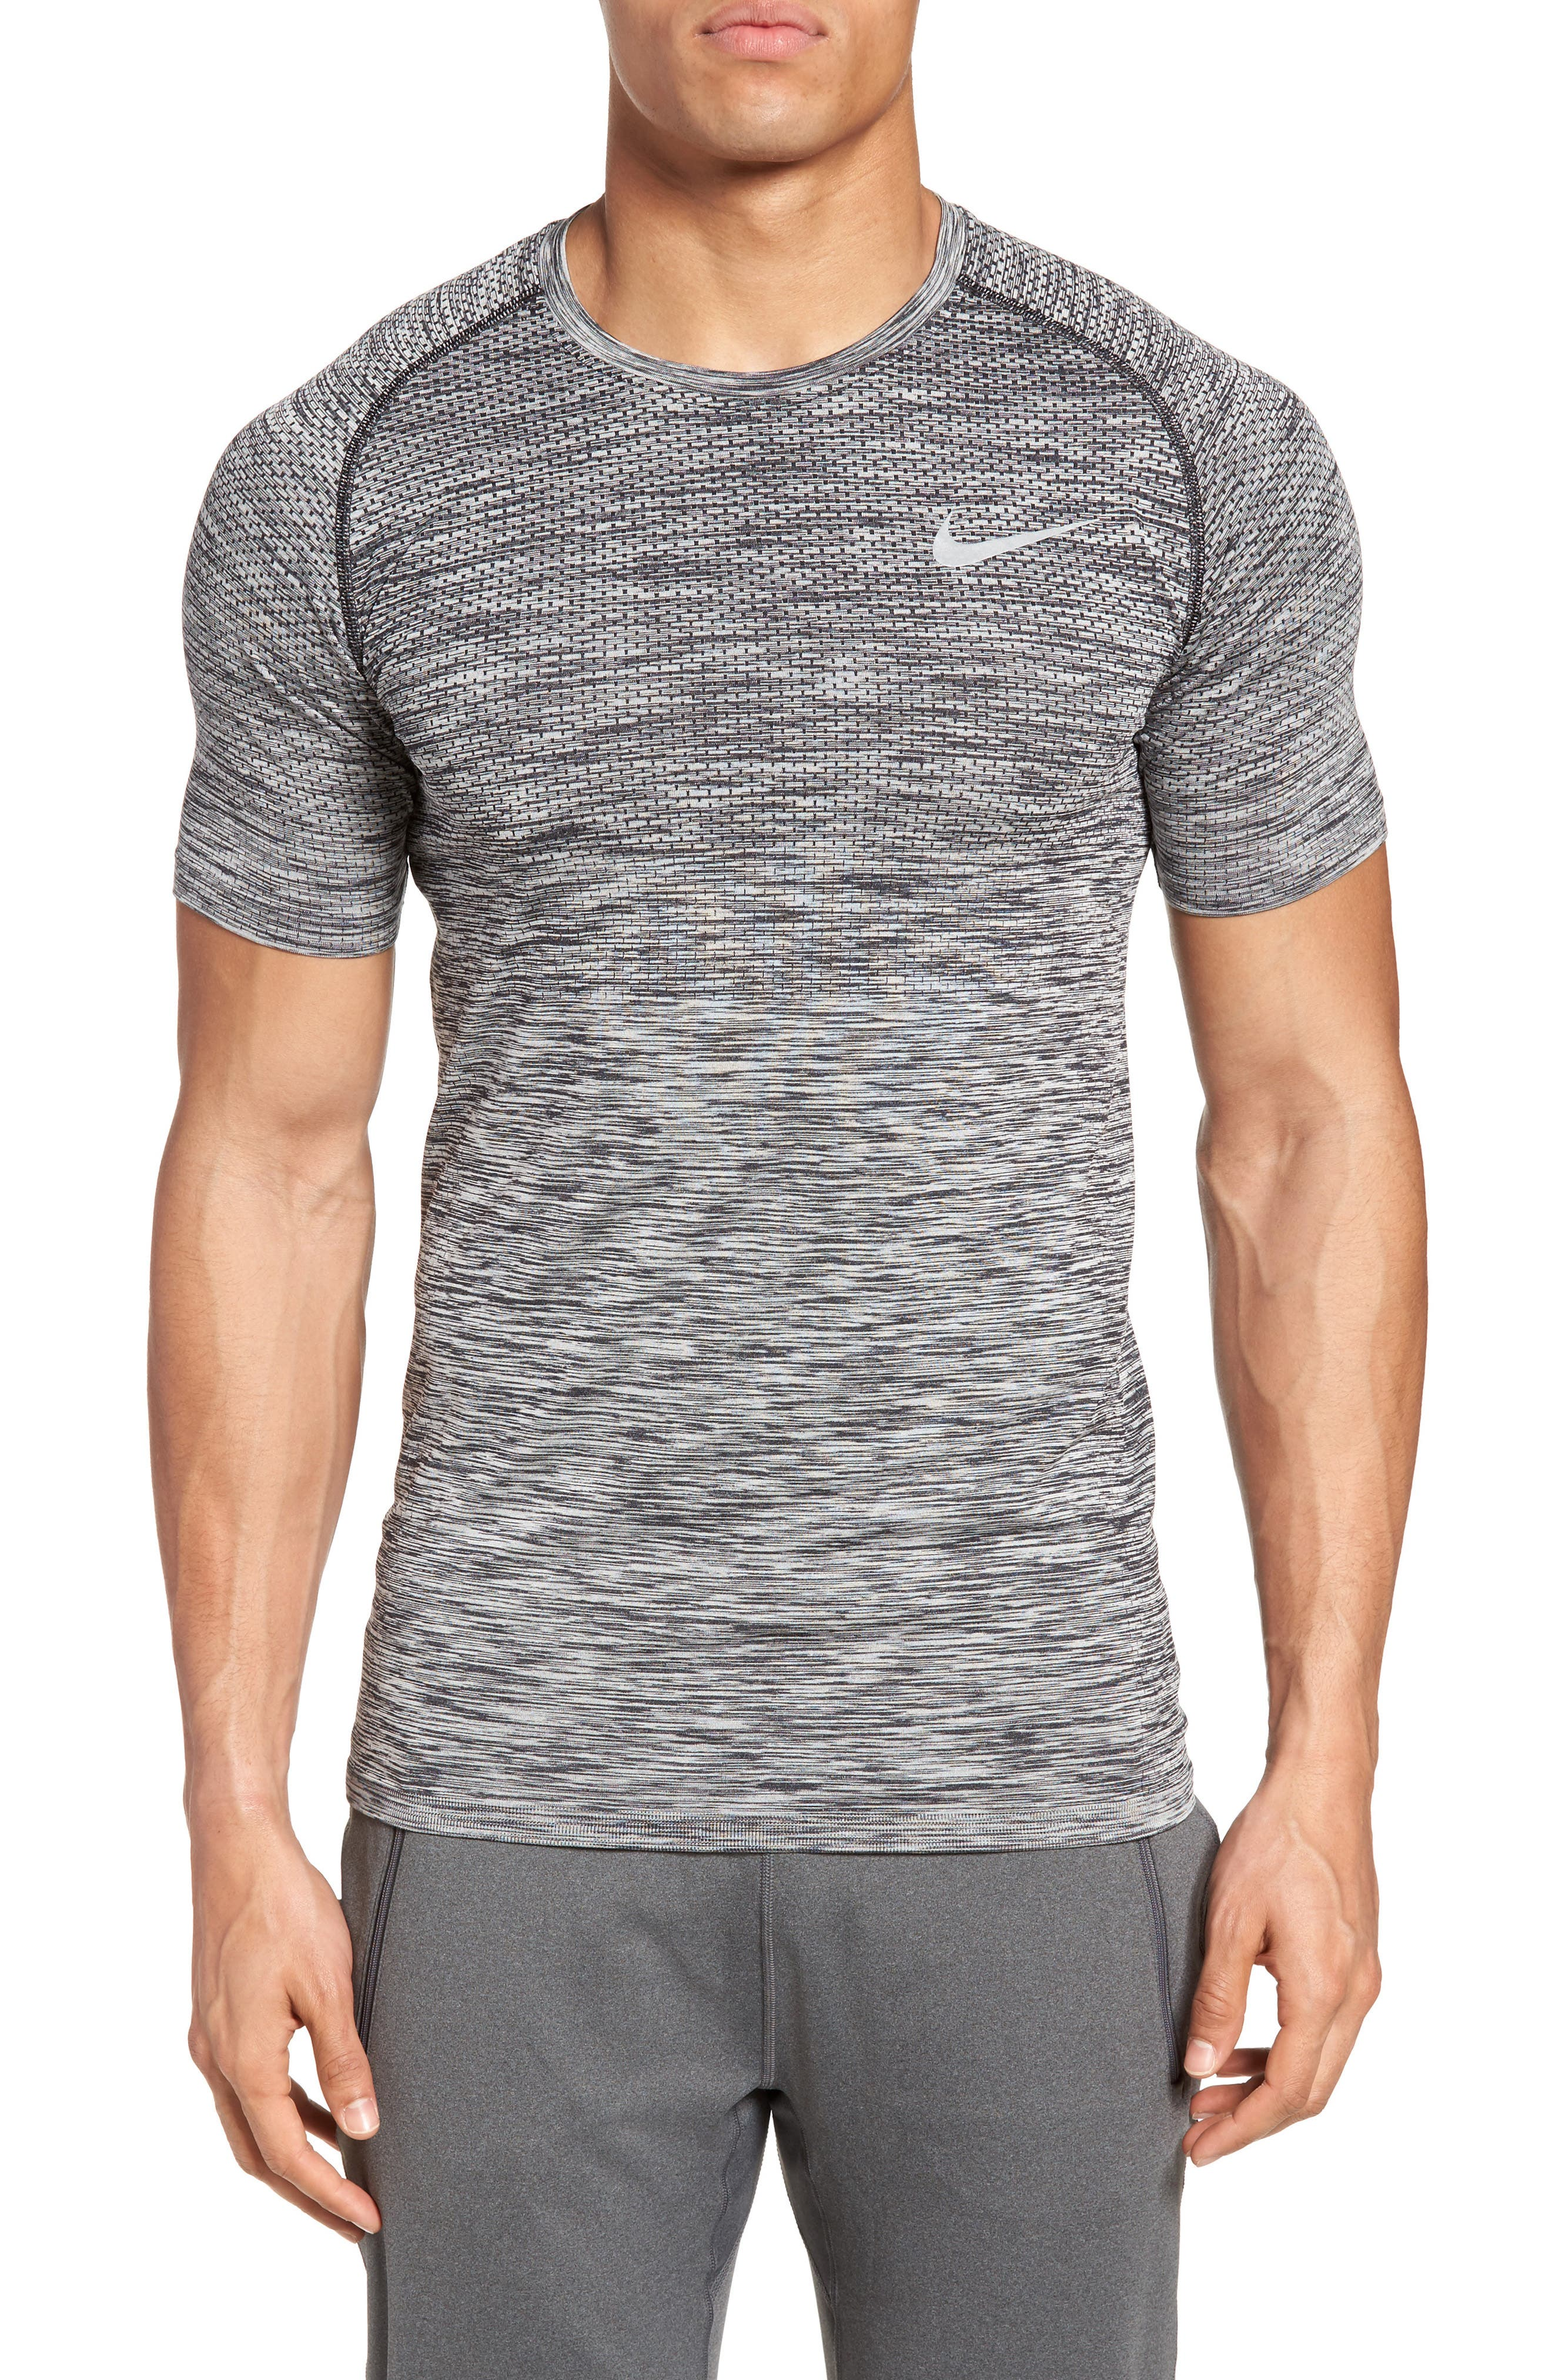 Men Dry Knit Running T-Shirt,                         Main,                         color, Black/ Heather